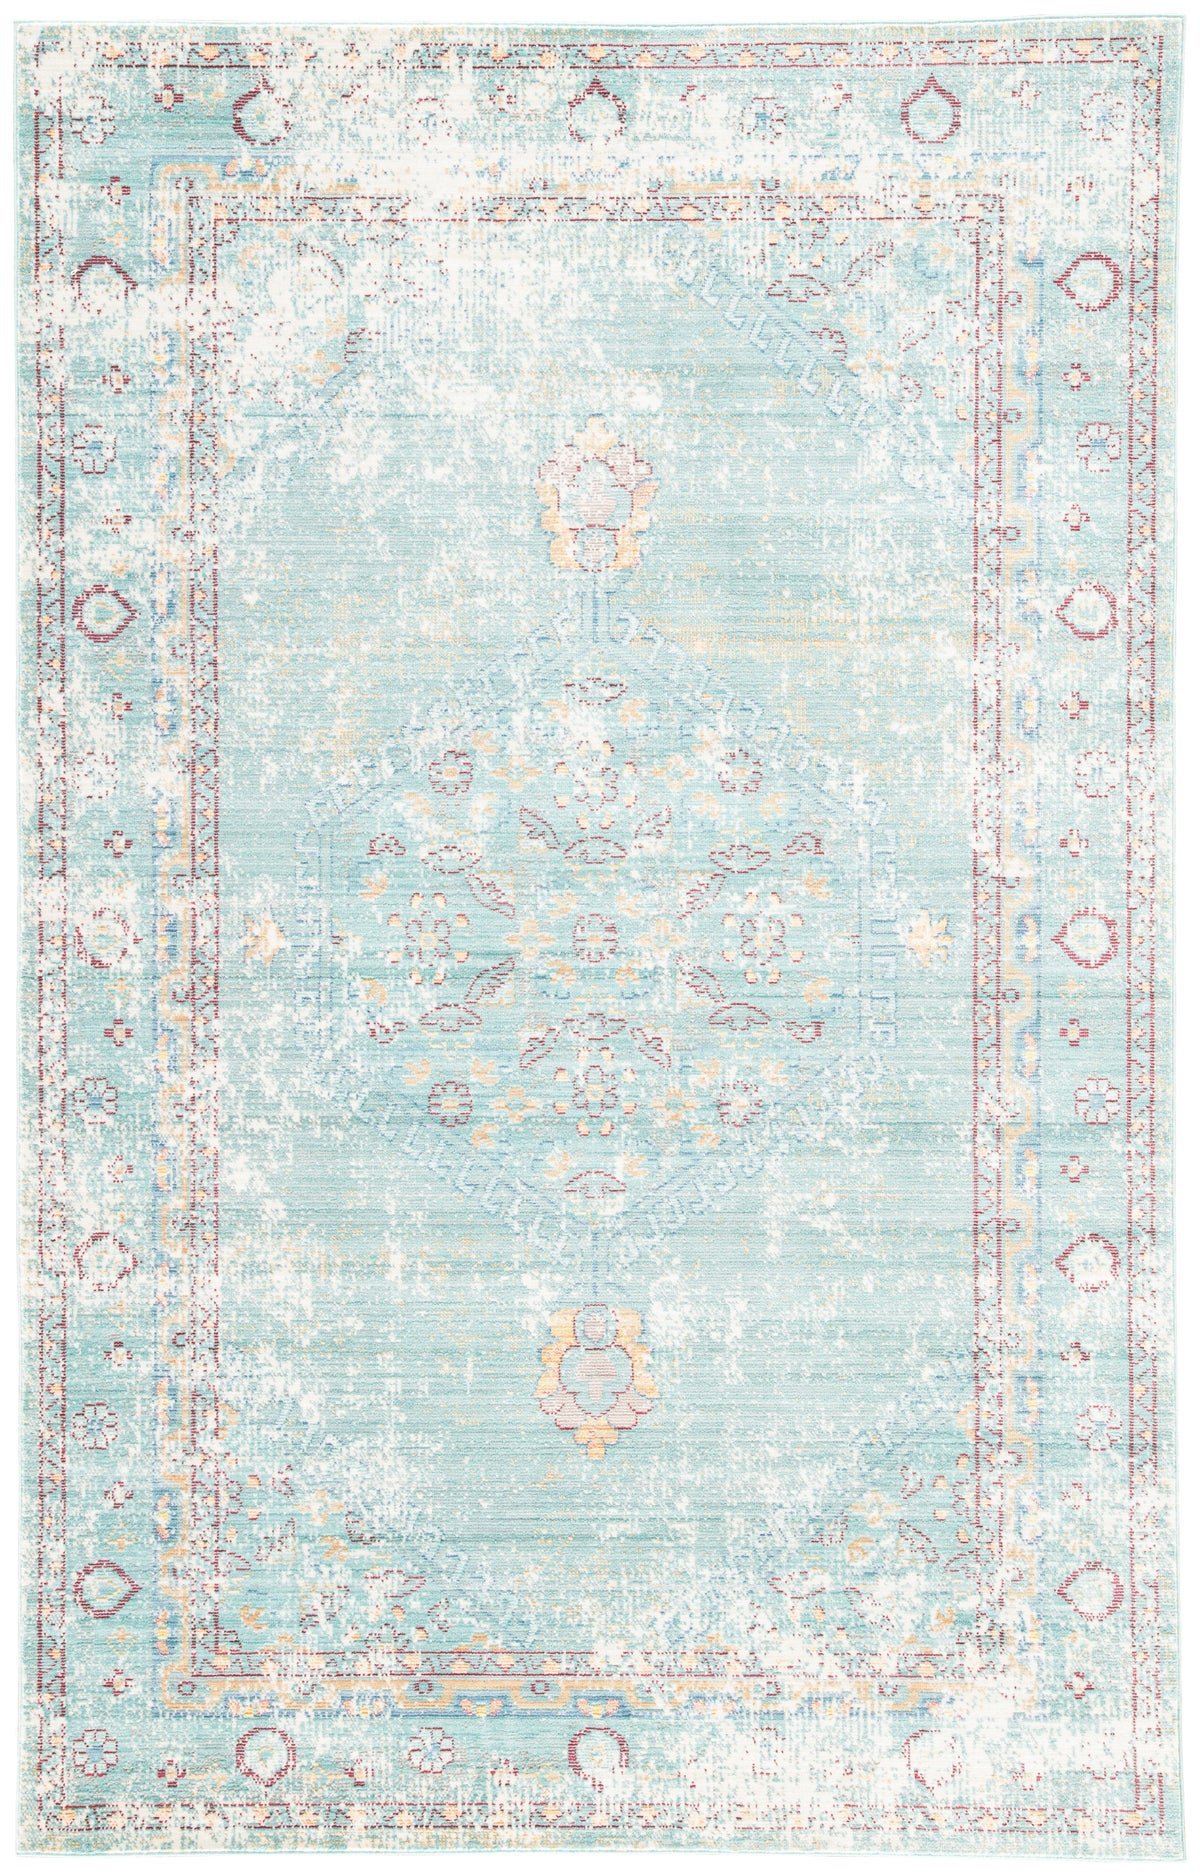 Latifa Vintage Medallion Area Rug by Wovenly| Shop the Look: Modern Farmhouse Boho Office | eDesign Tribe Blog